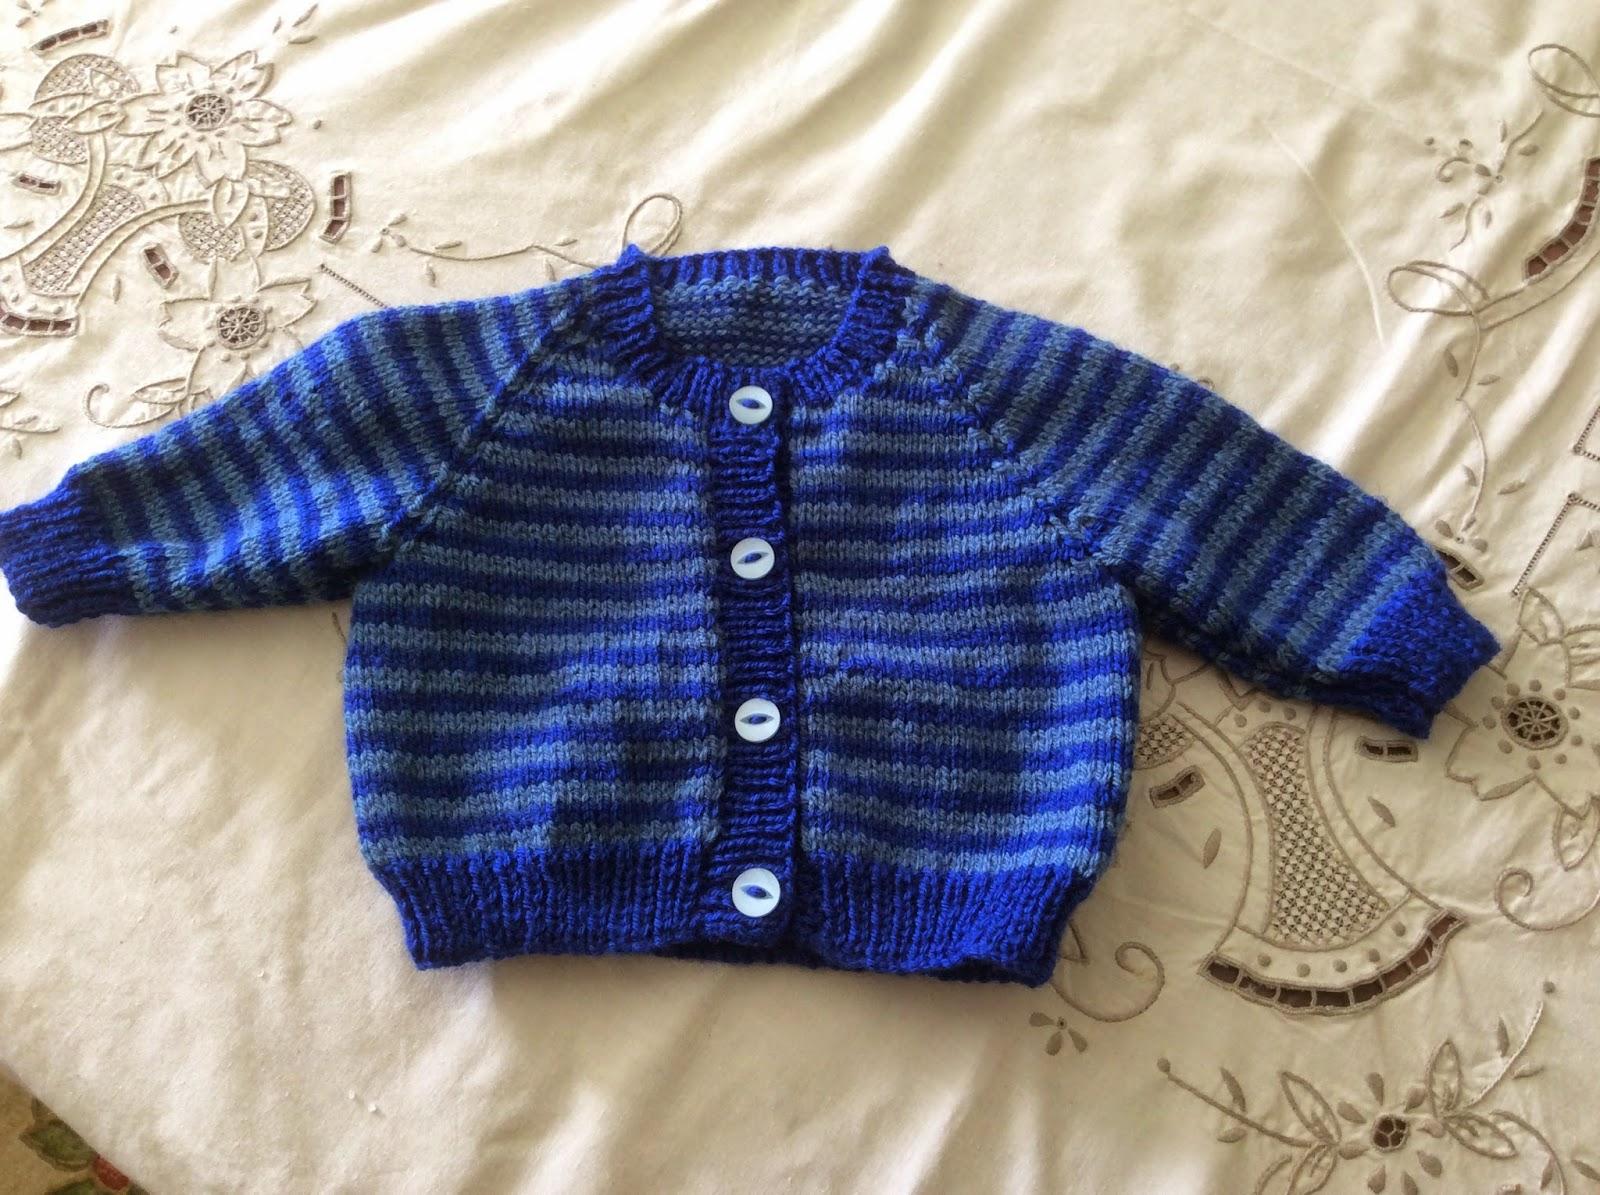 Aldi Knitting Pattern Baby Blanket : Yarning away: Starting off......